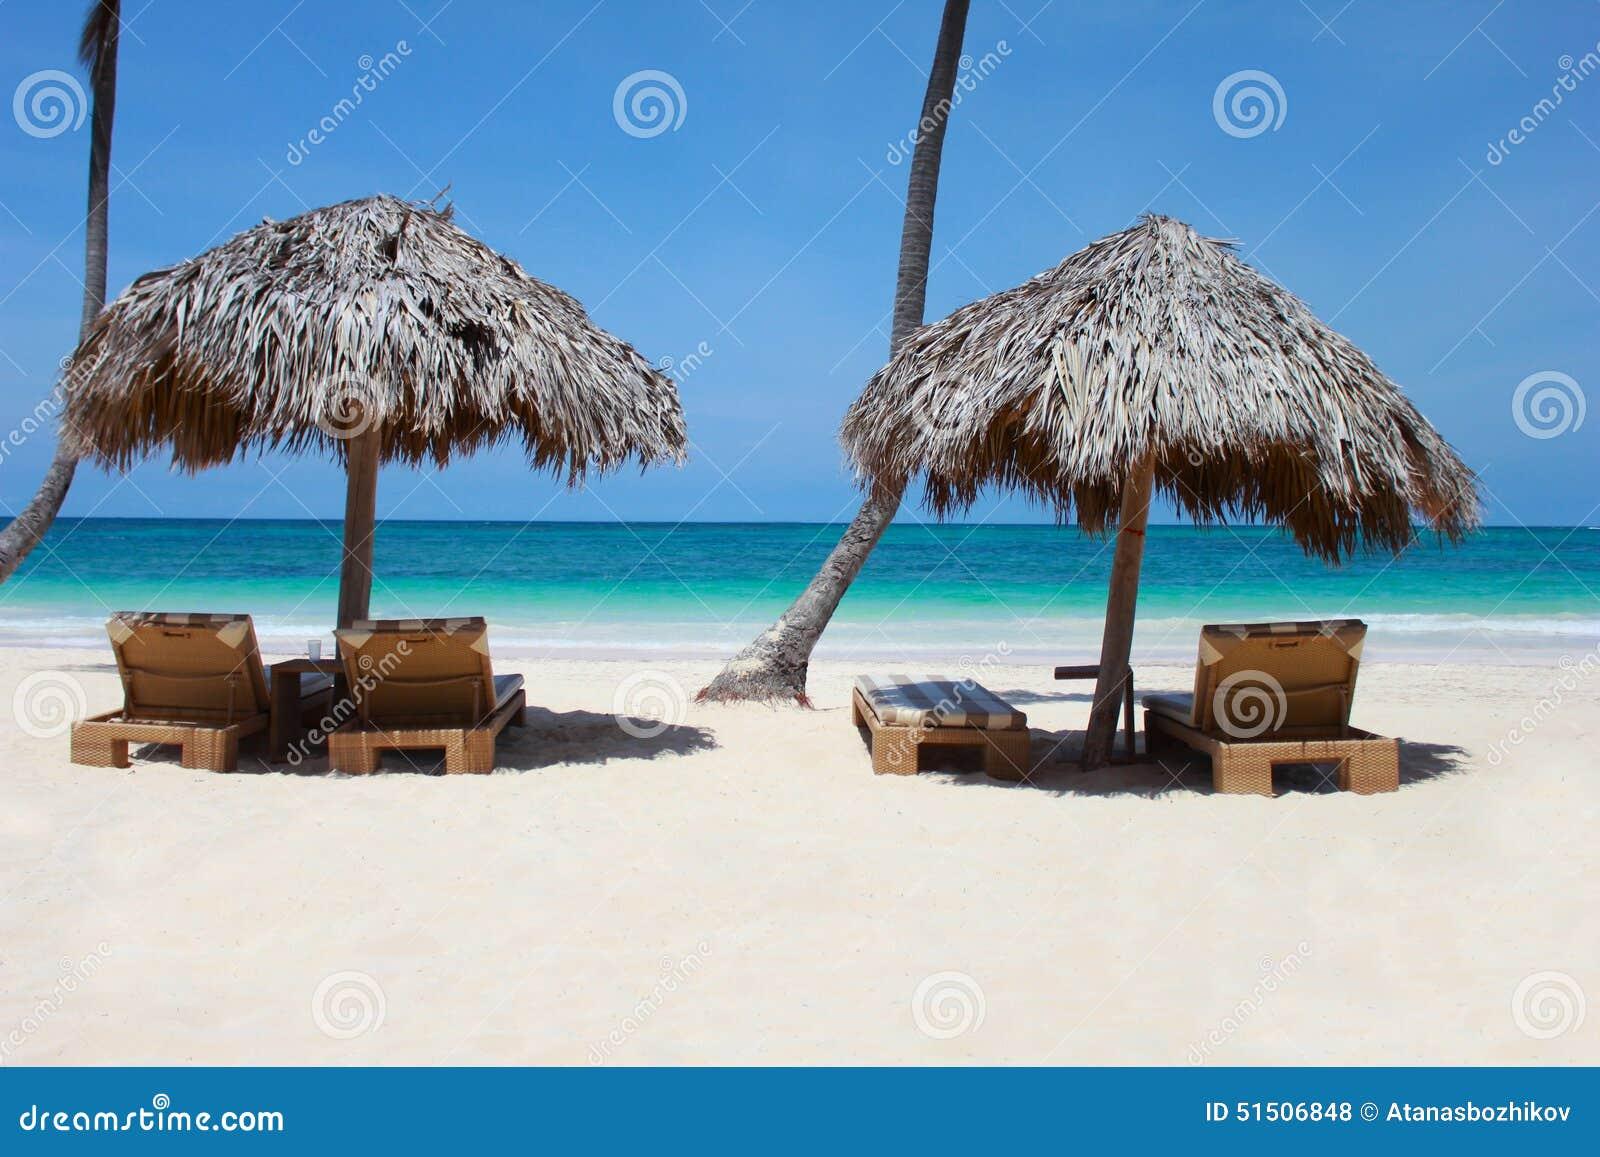 Carte Postale De Punta Cana Photo stock - Image du présidences, salon: 51506848